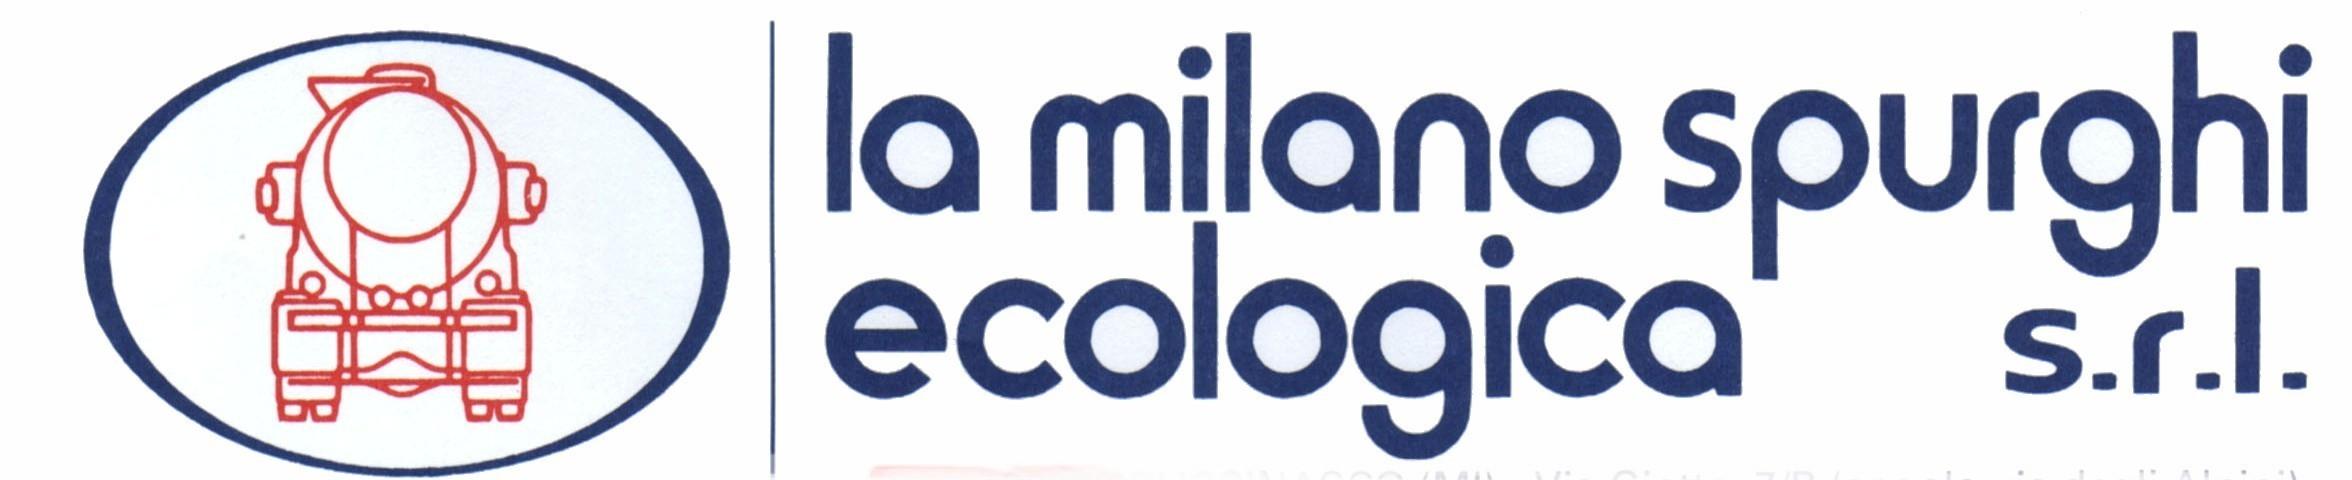 la-milano-spurghi-ecologica-srl